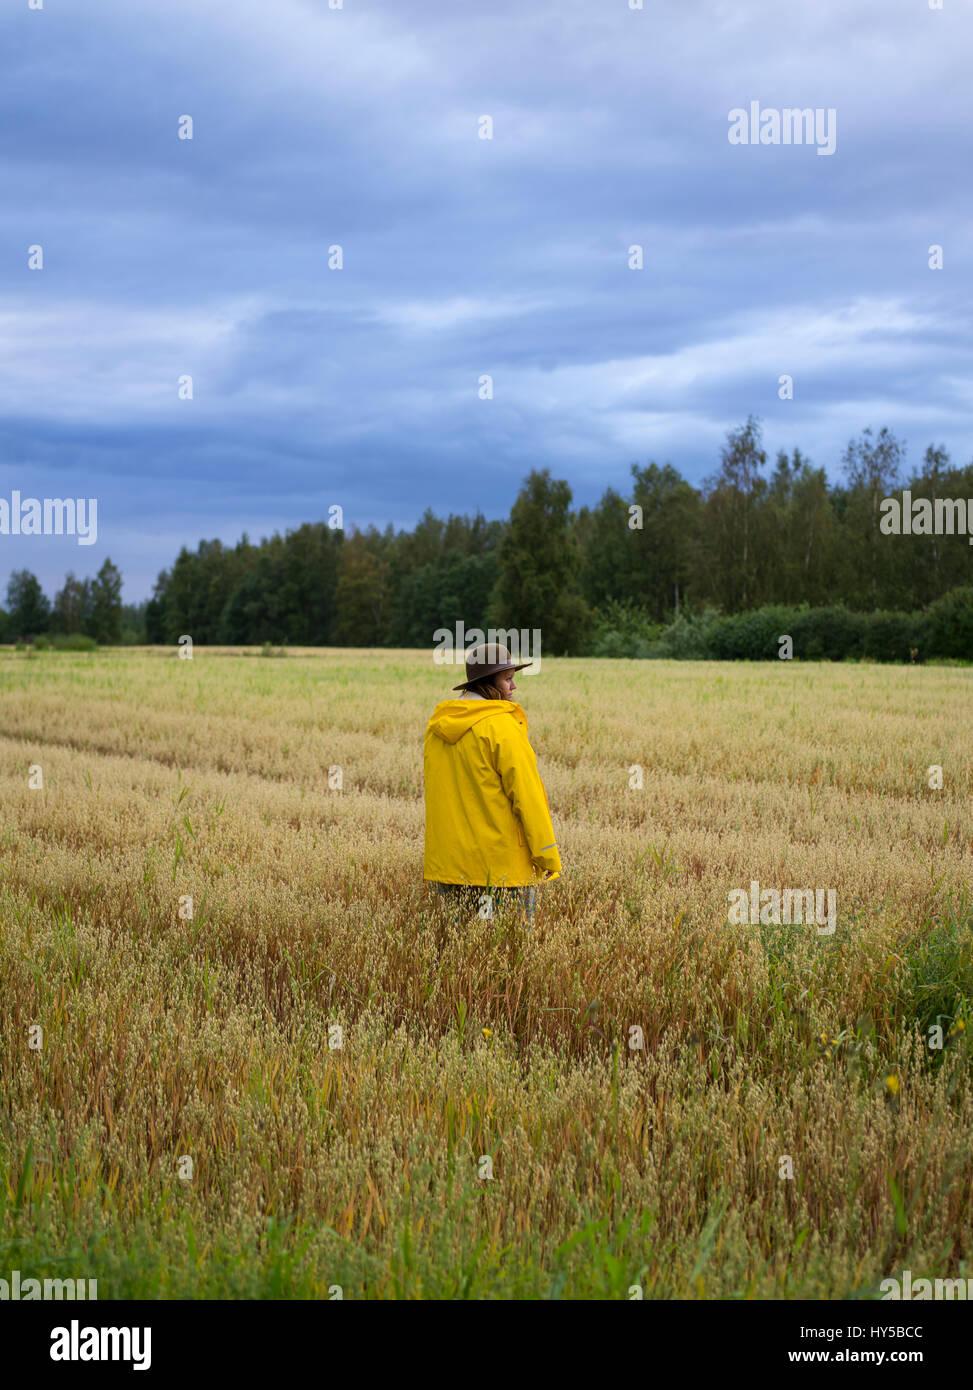 Finland, Ostrobothnia, Kruunupyy, Woman wearing raincoat standing in field - Stock Image